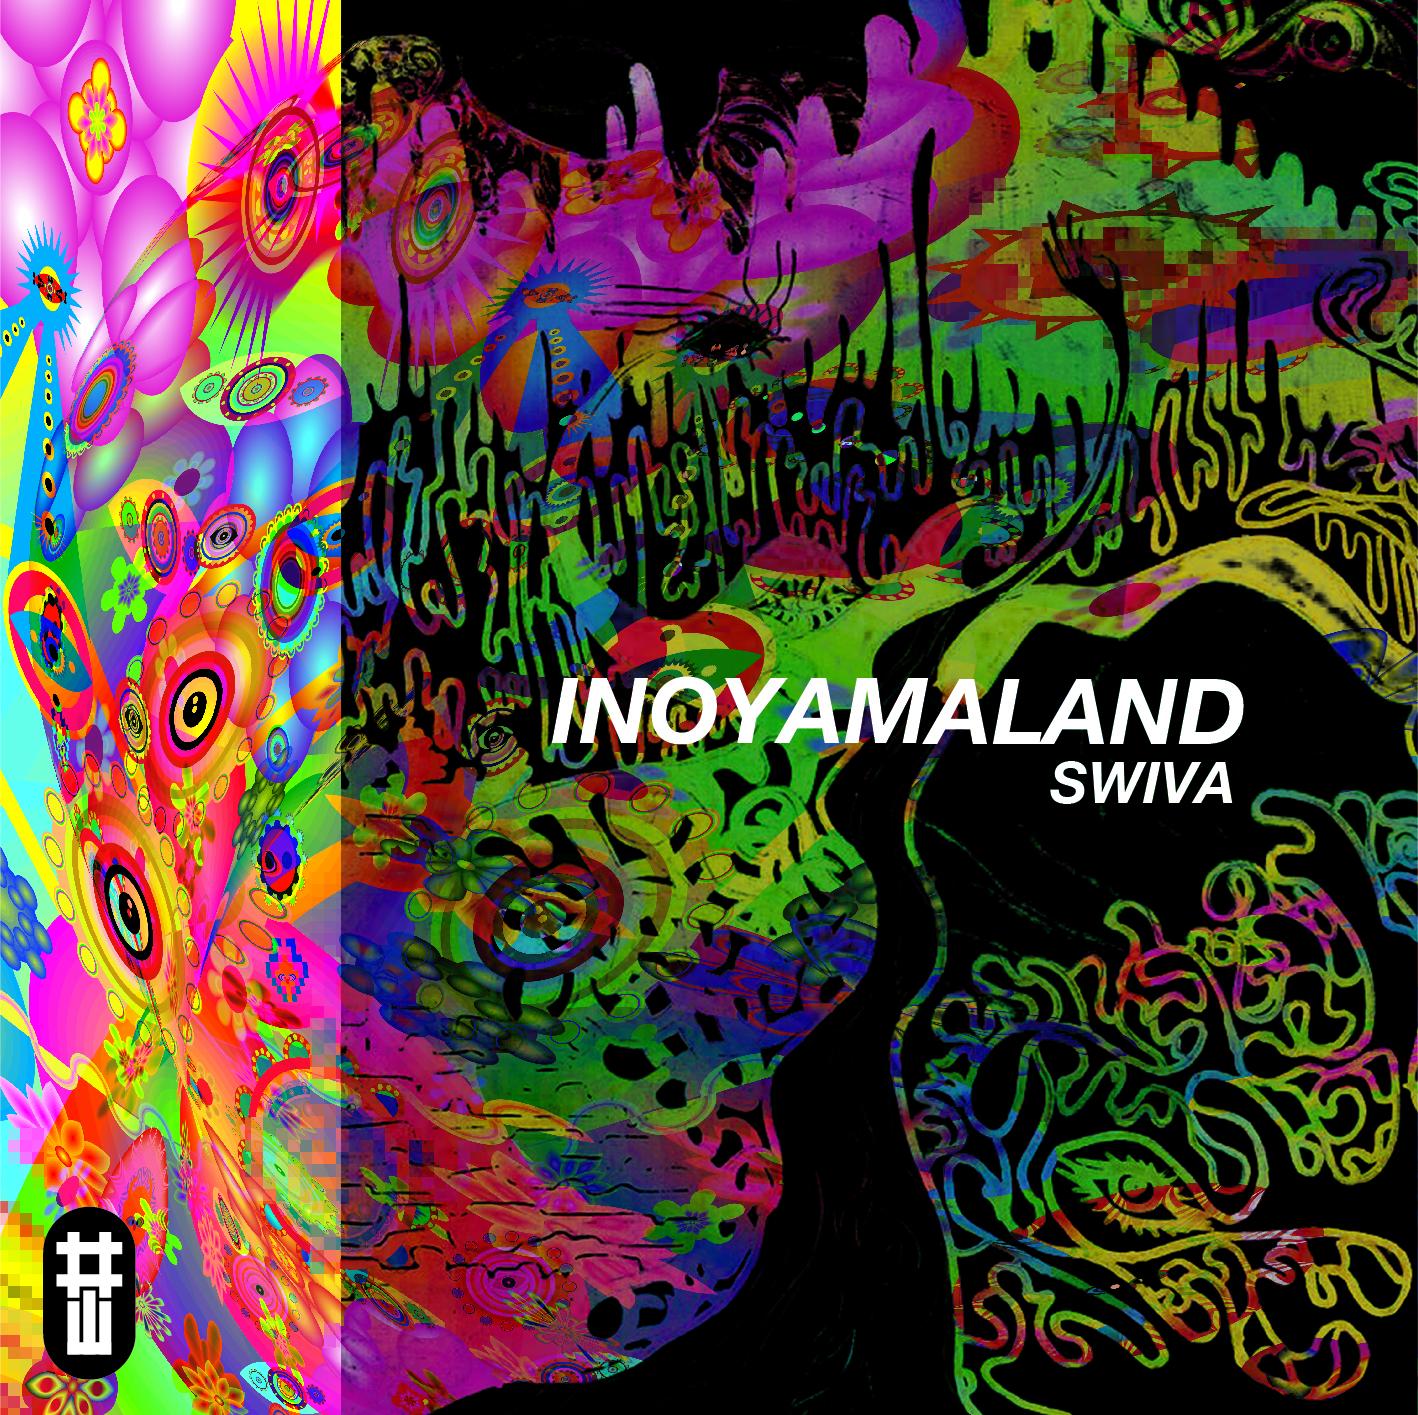 INOYAMALAND / SWIVA CD